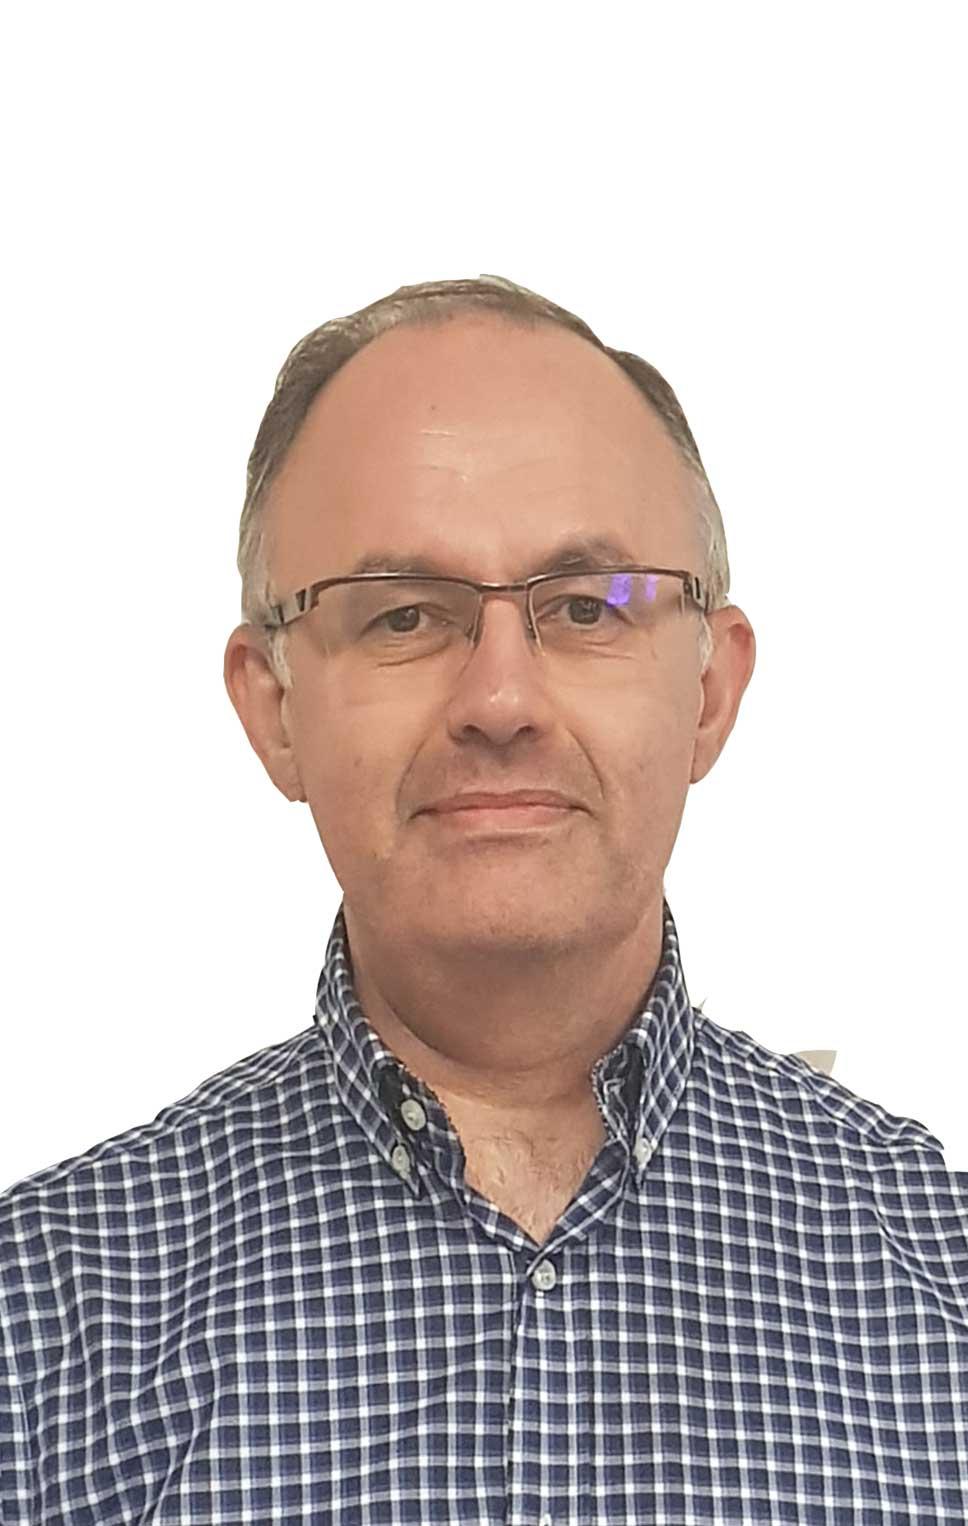 José Luís Cividanes Matos